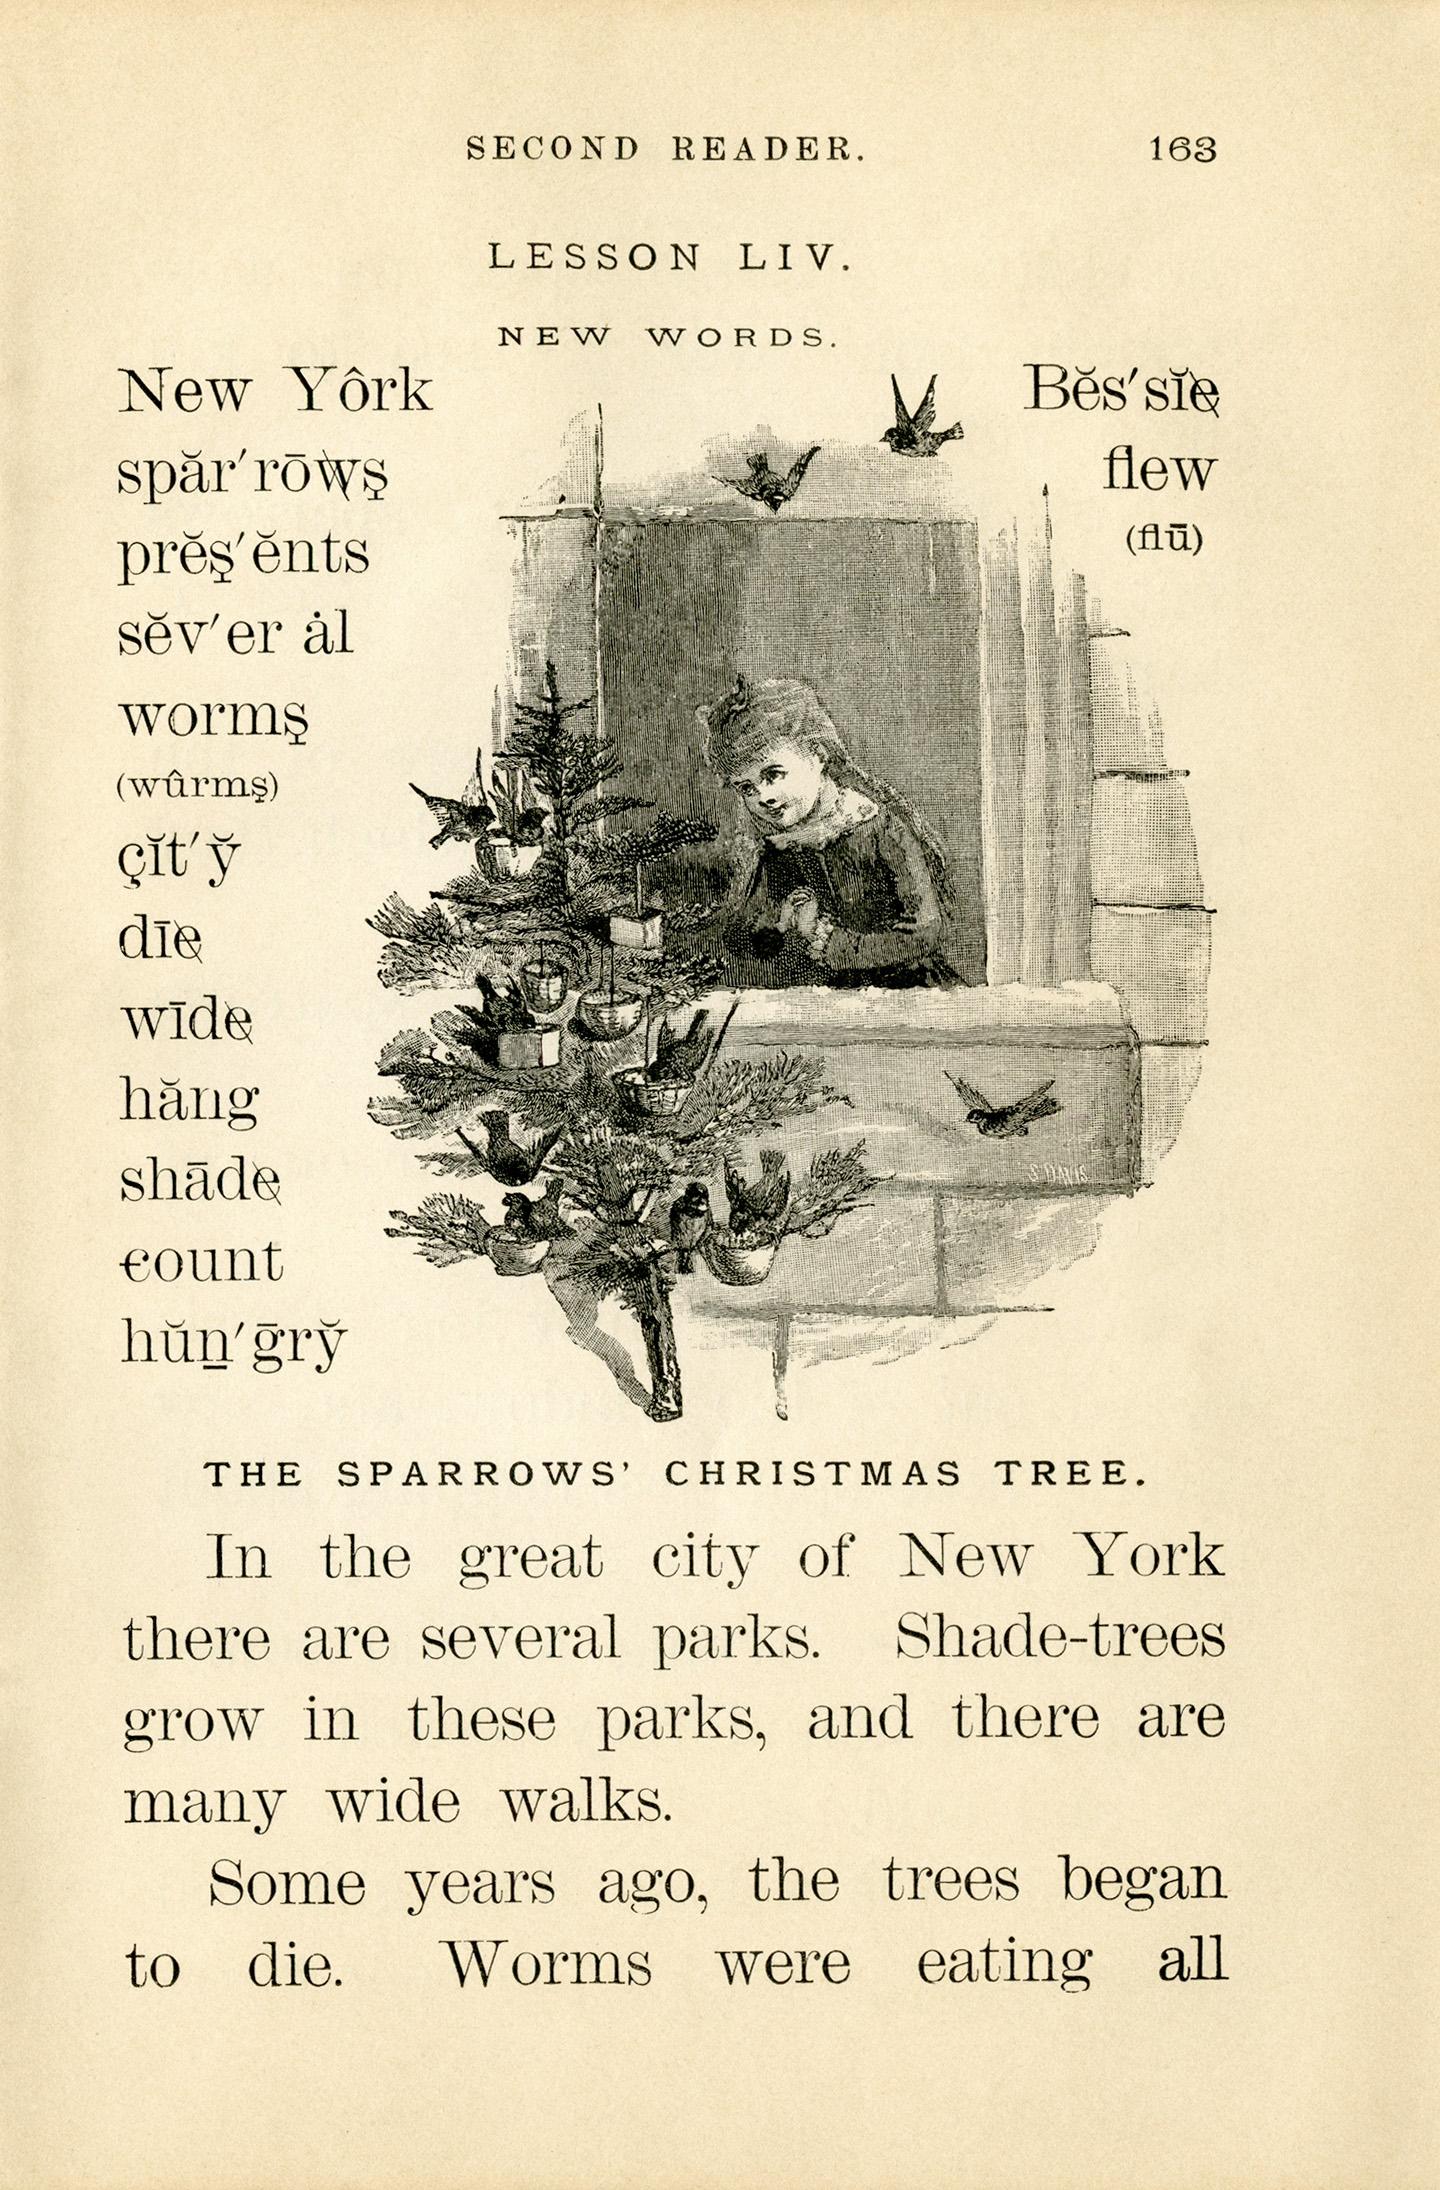 Free printable Sparrows Christmas Tree story